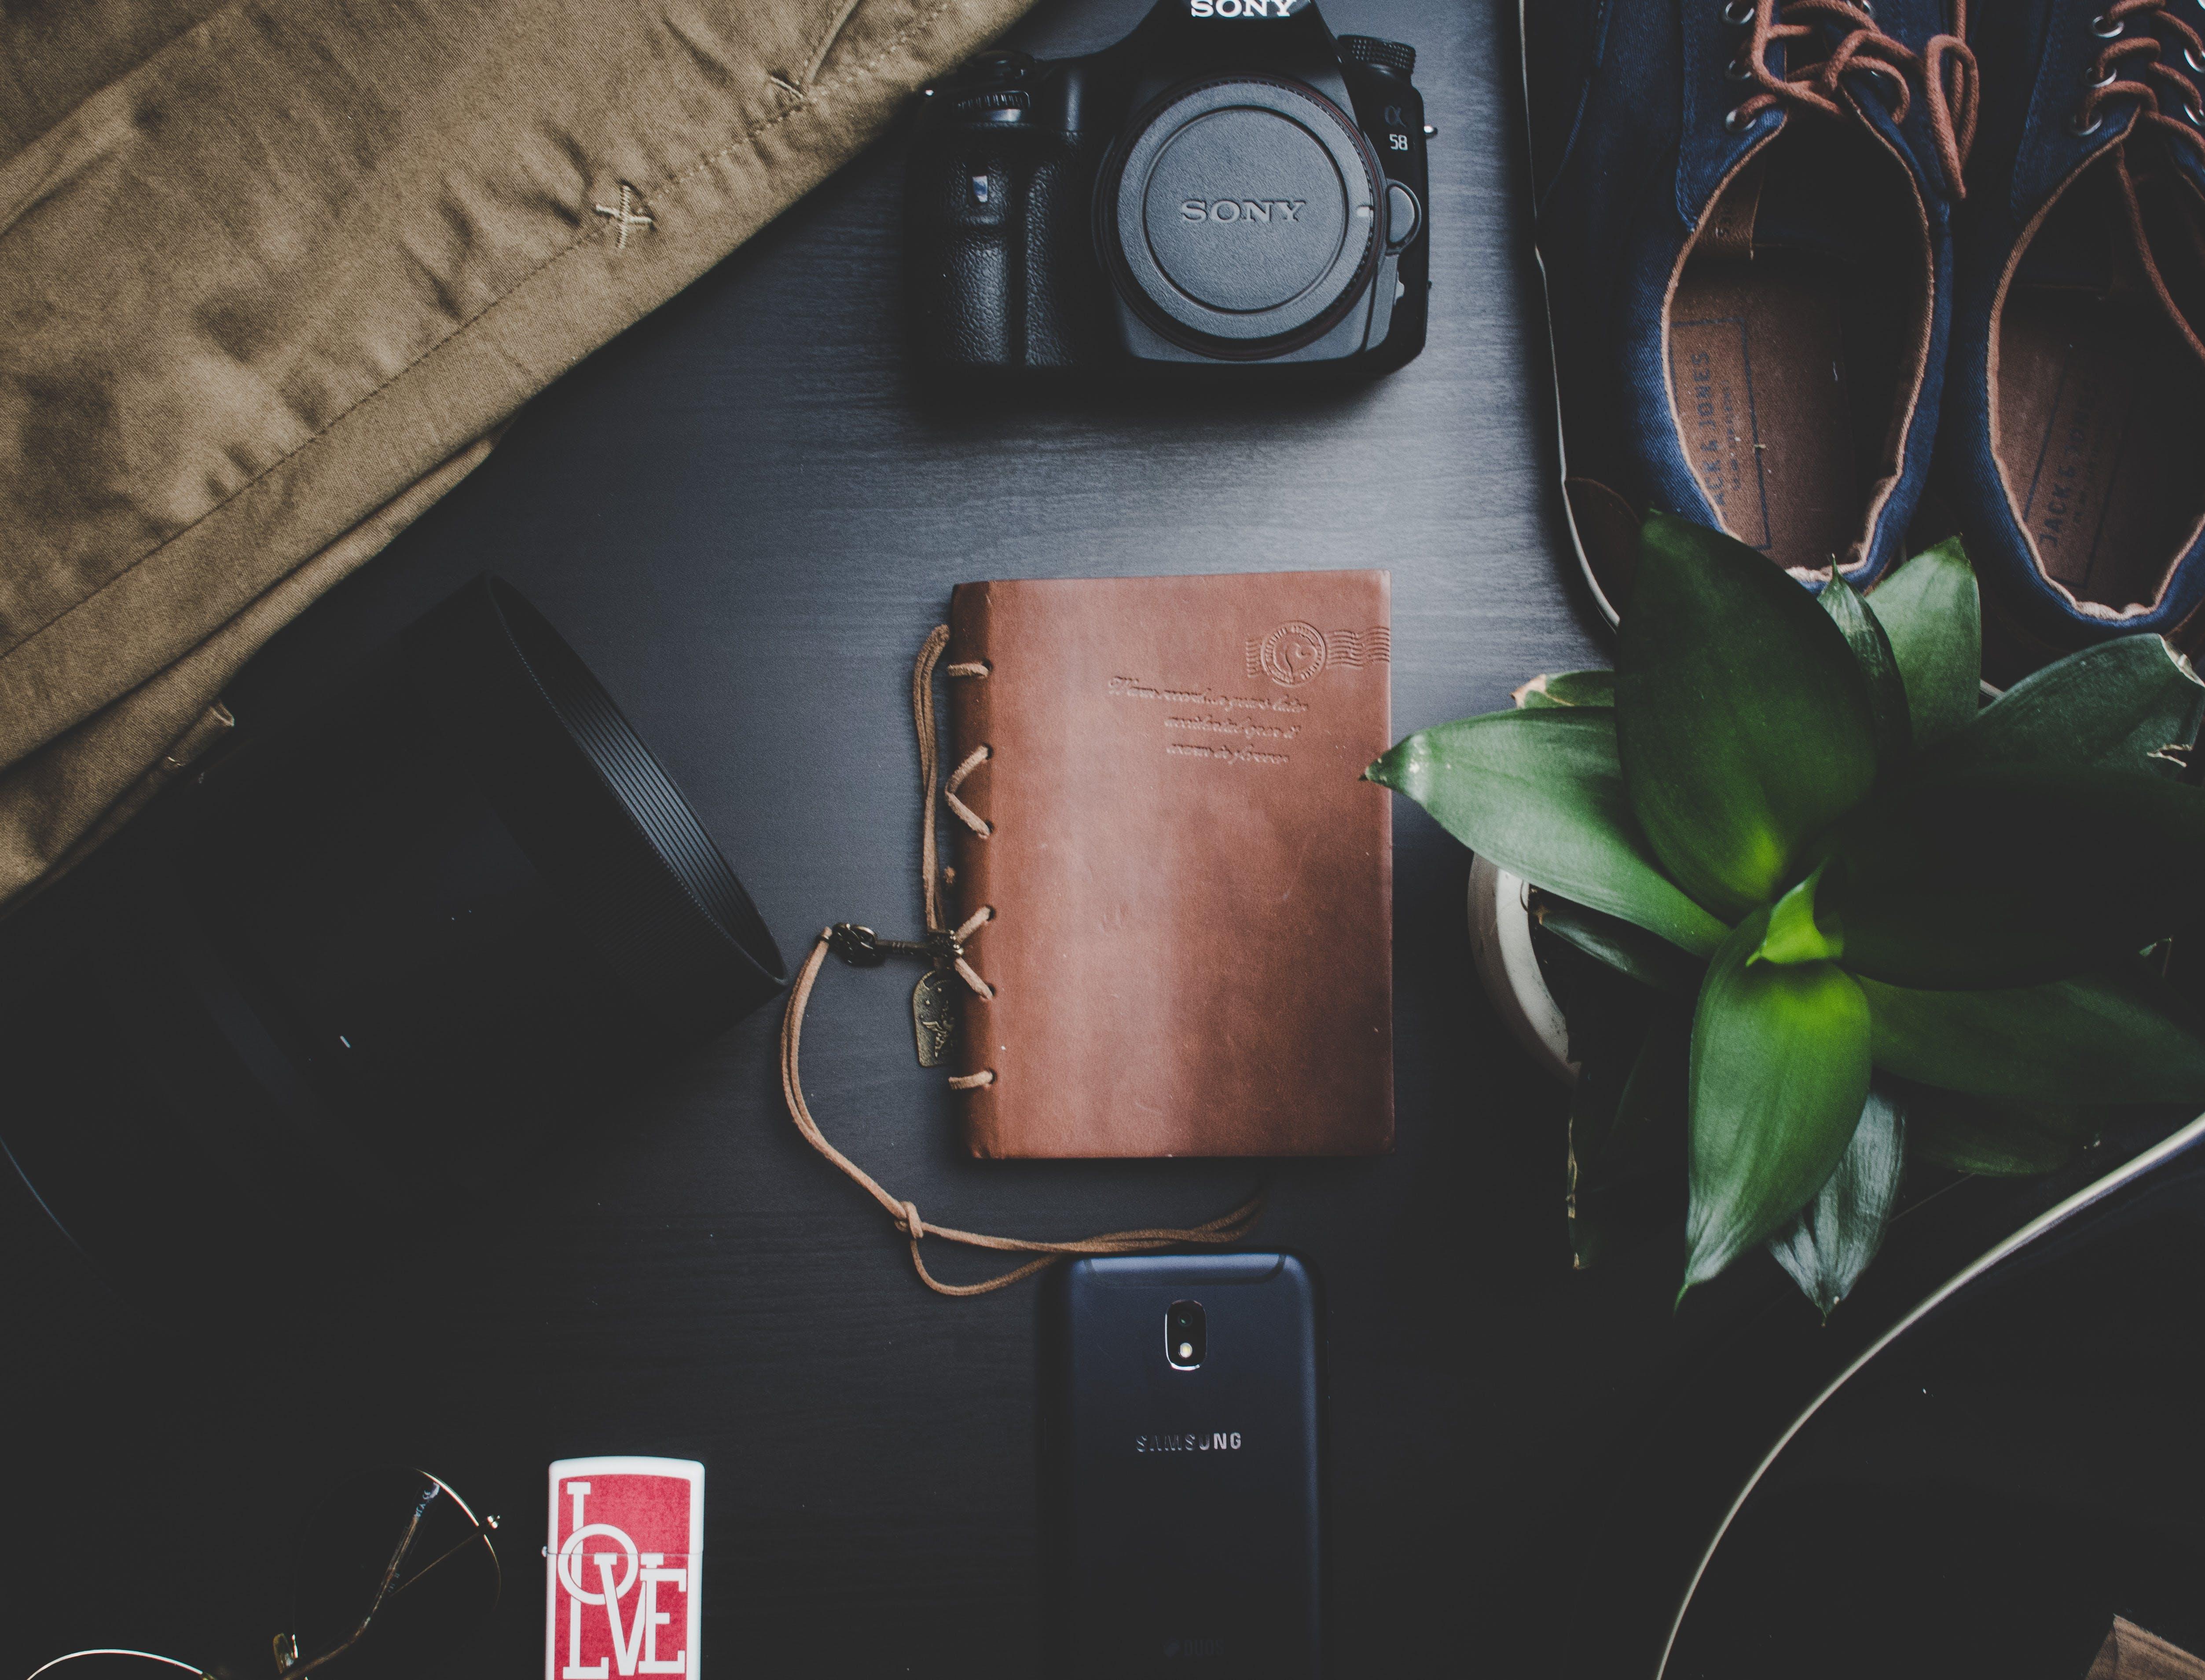 Black Sony Dslr Camera Beside Brown Notebook